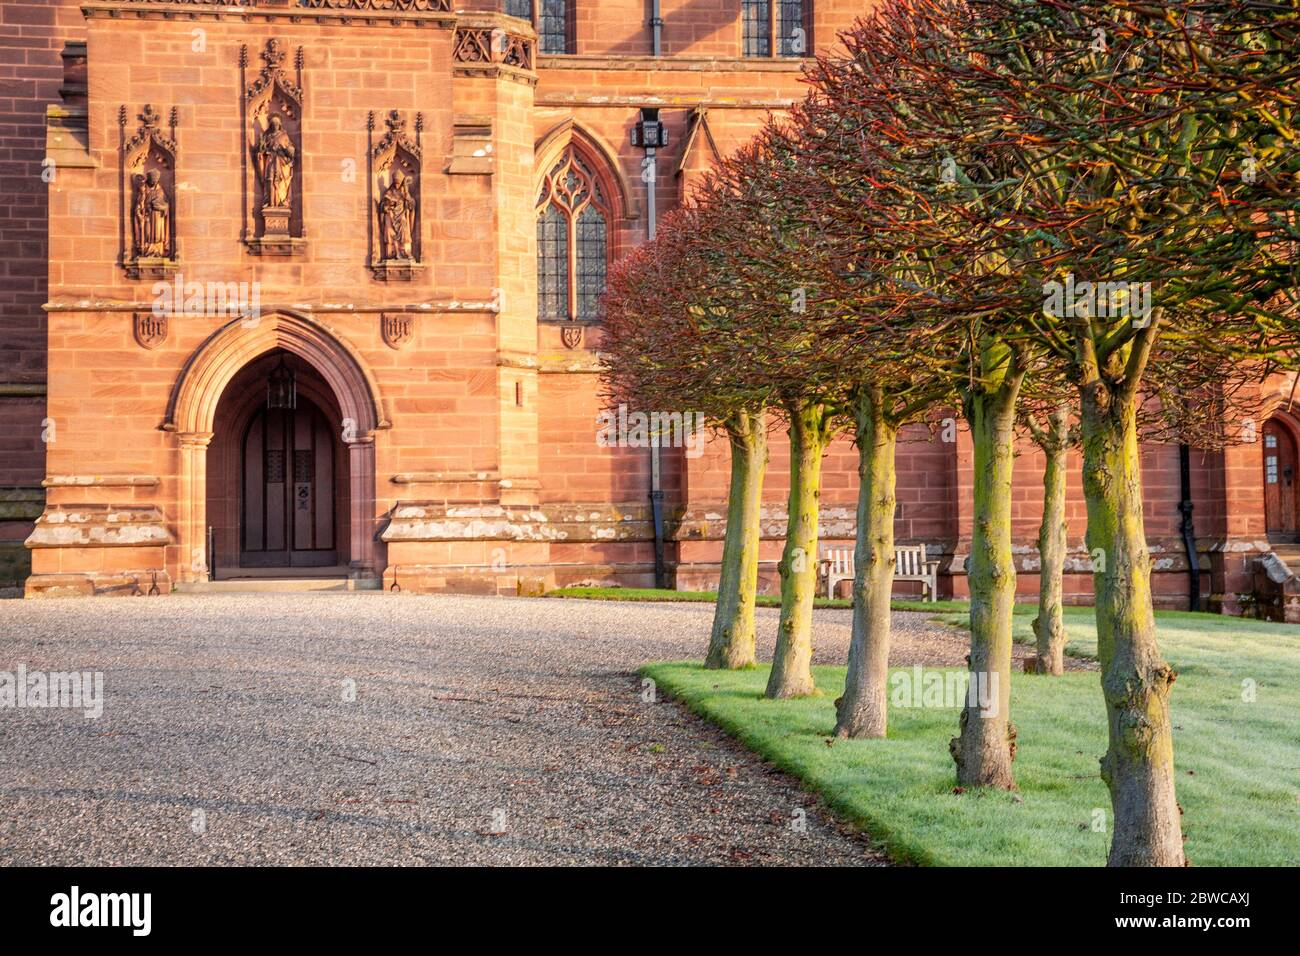 Eccleston parish church, Cheshire, England Stock Photo